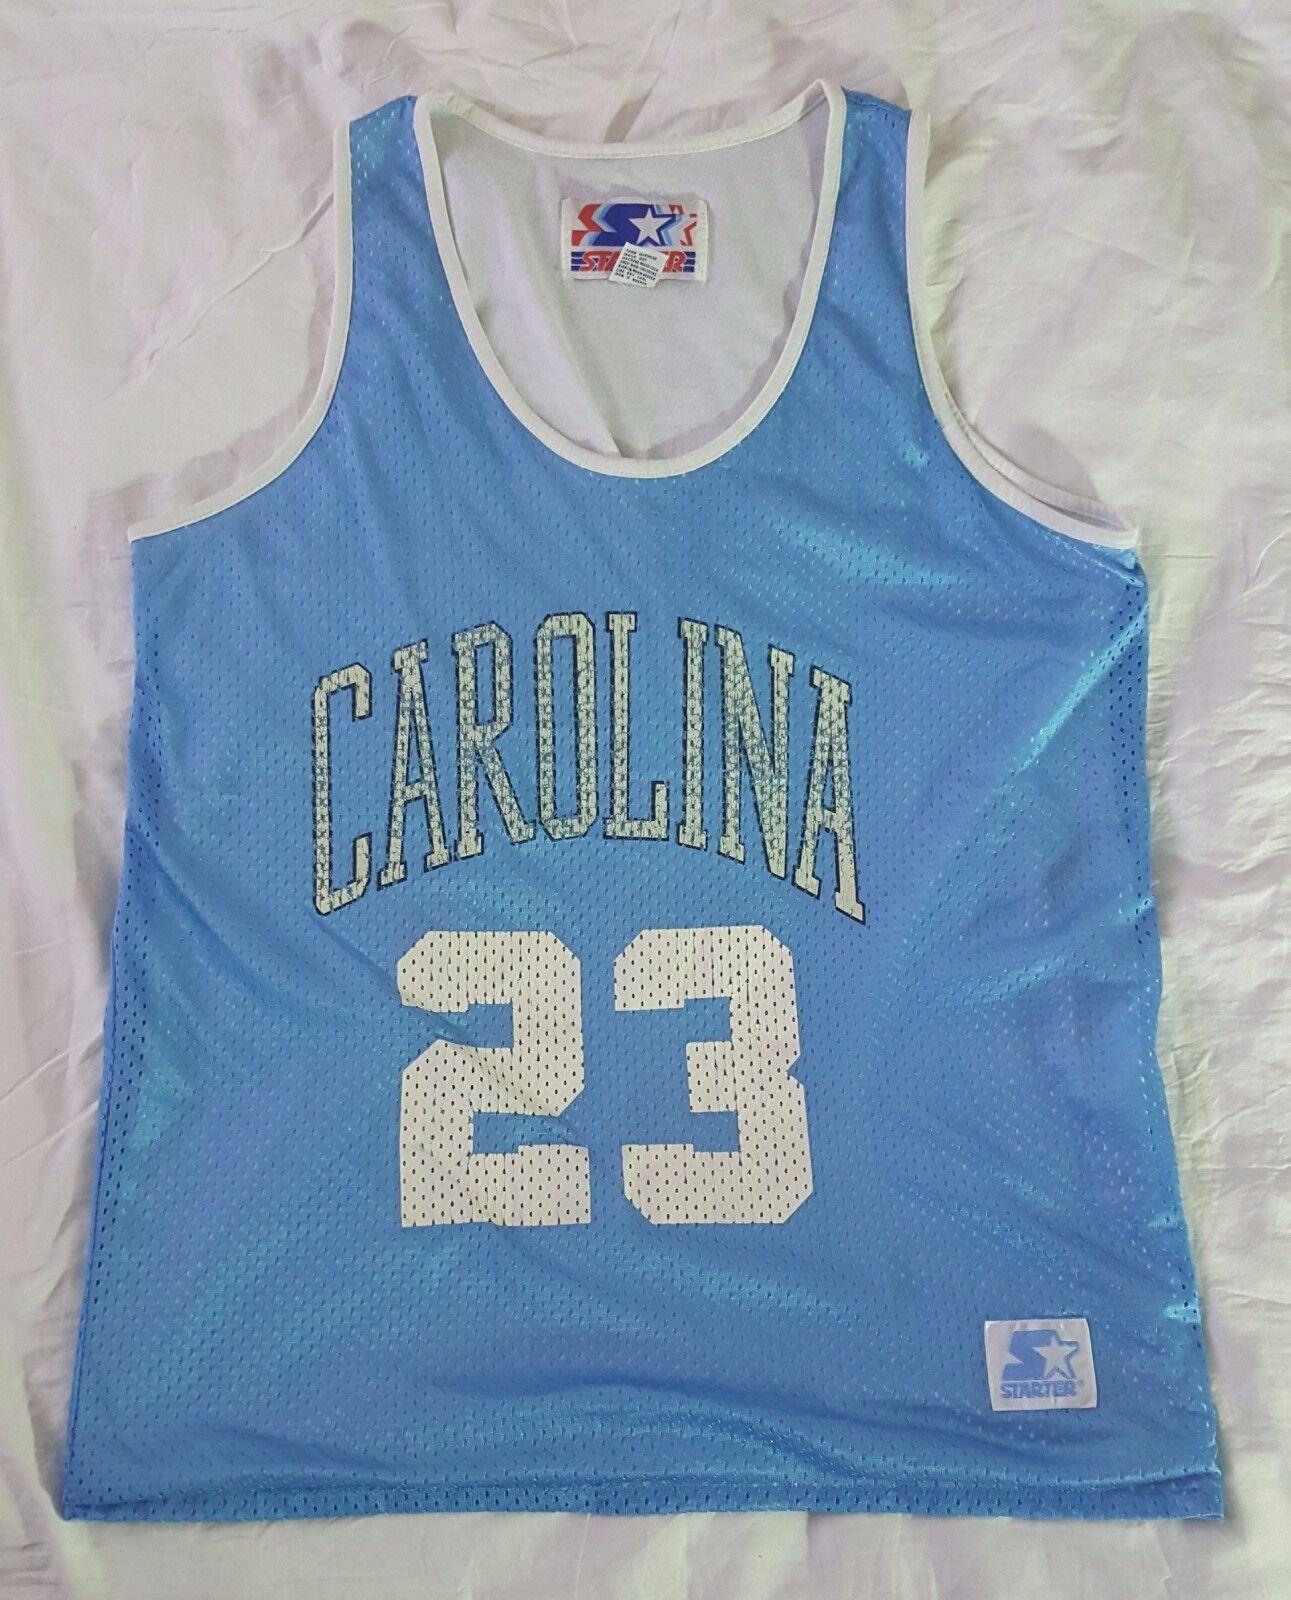 Vintage RARE Starter JORDAN North Carolina Tar Heels Jersey Größe L (fits like M)